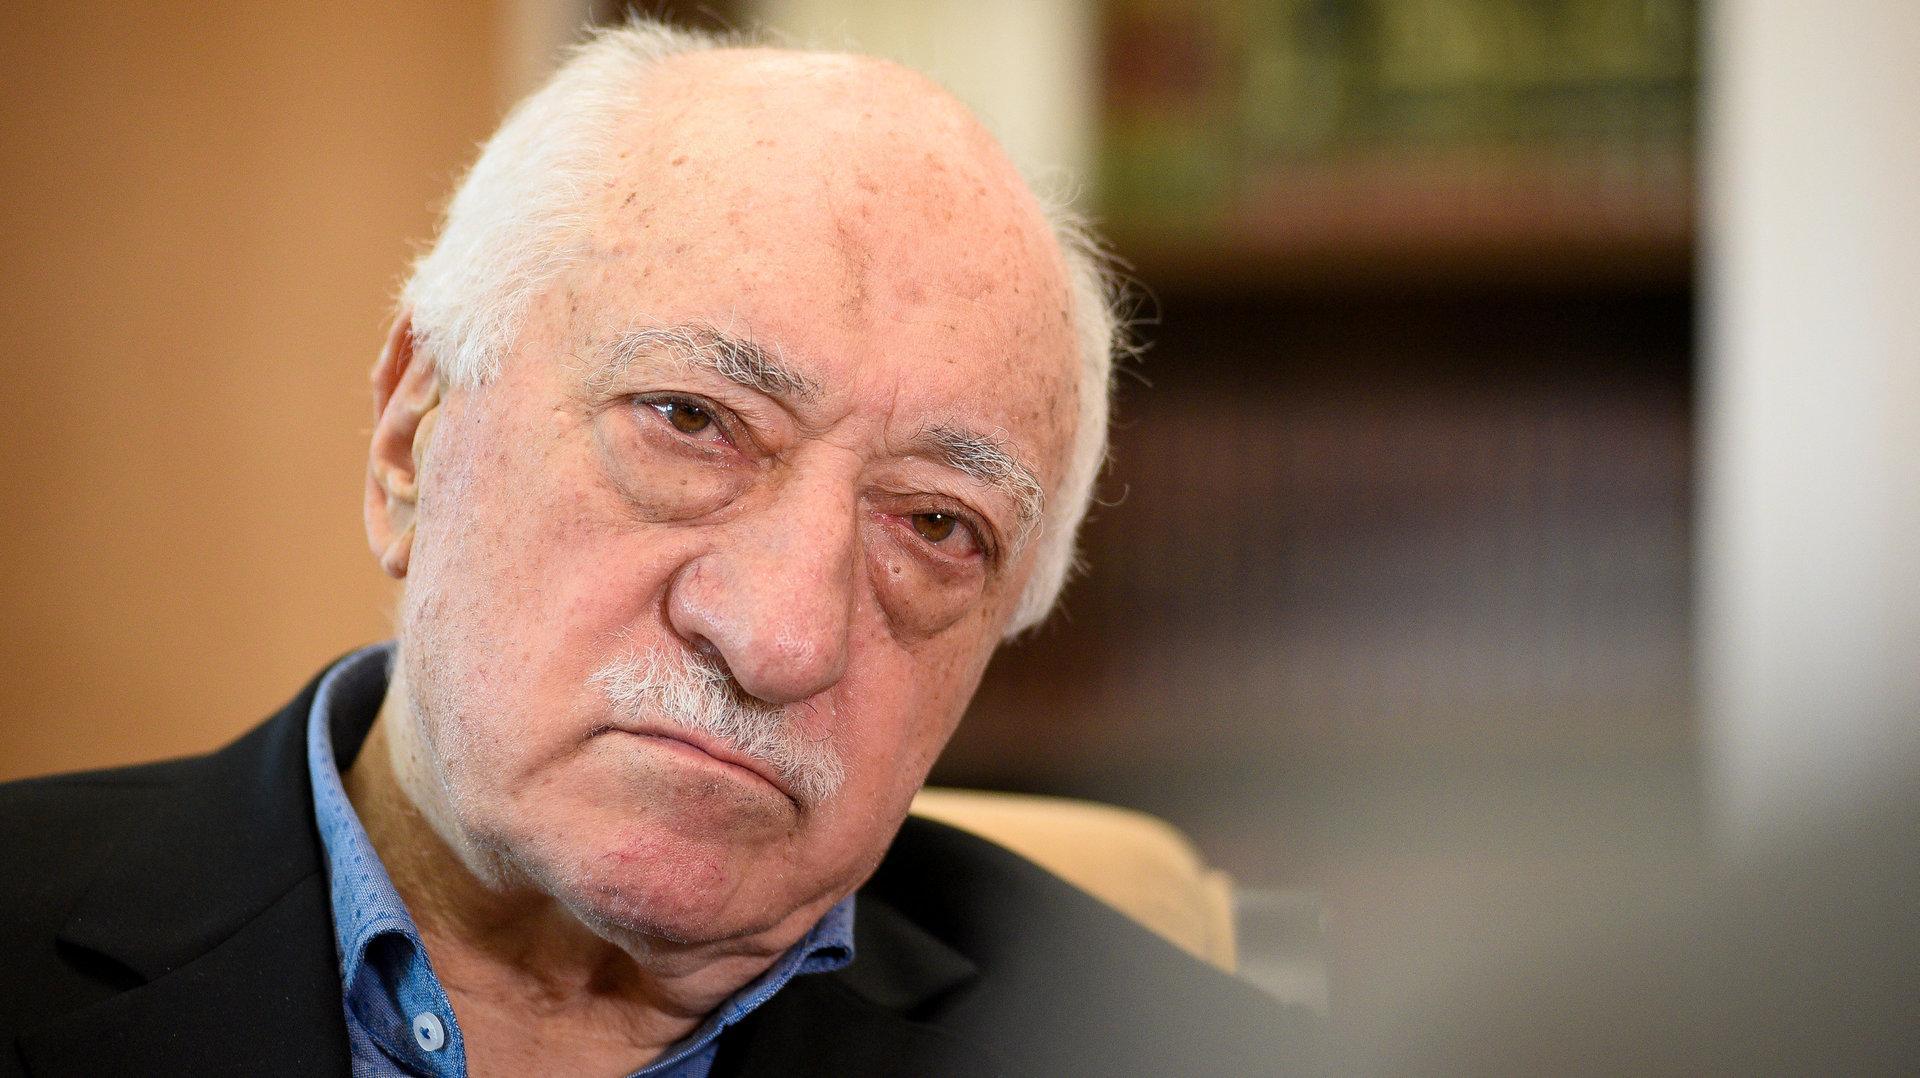 Türkei: 118 Haftbefehle gegen mutmaßliche Gülen-Anhänger